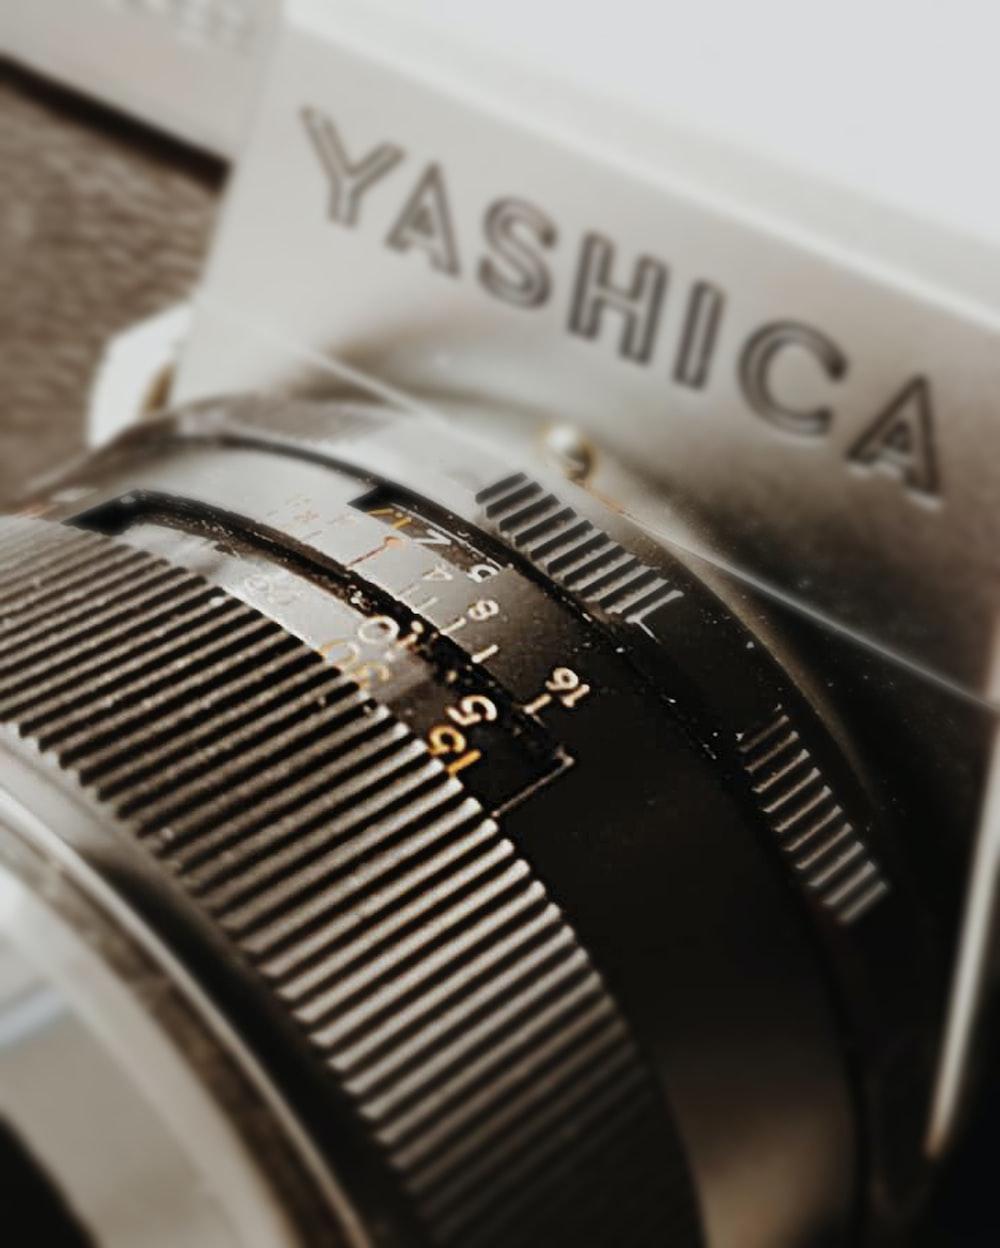 black and gray Yashica camera